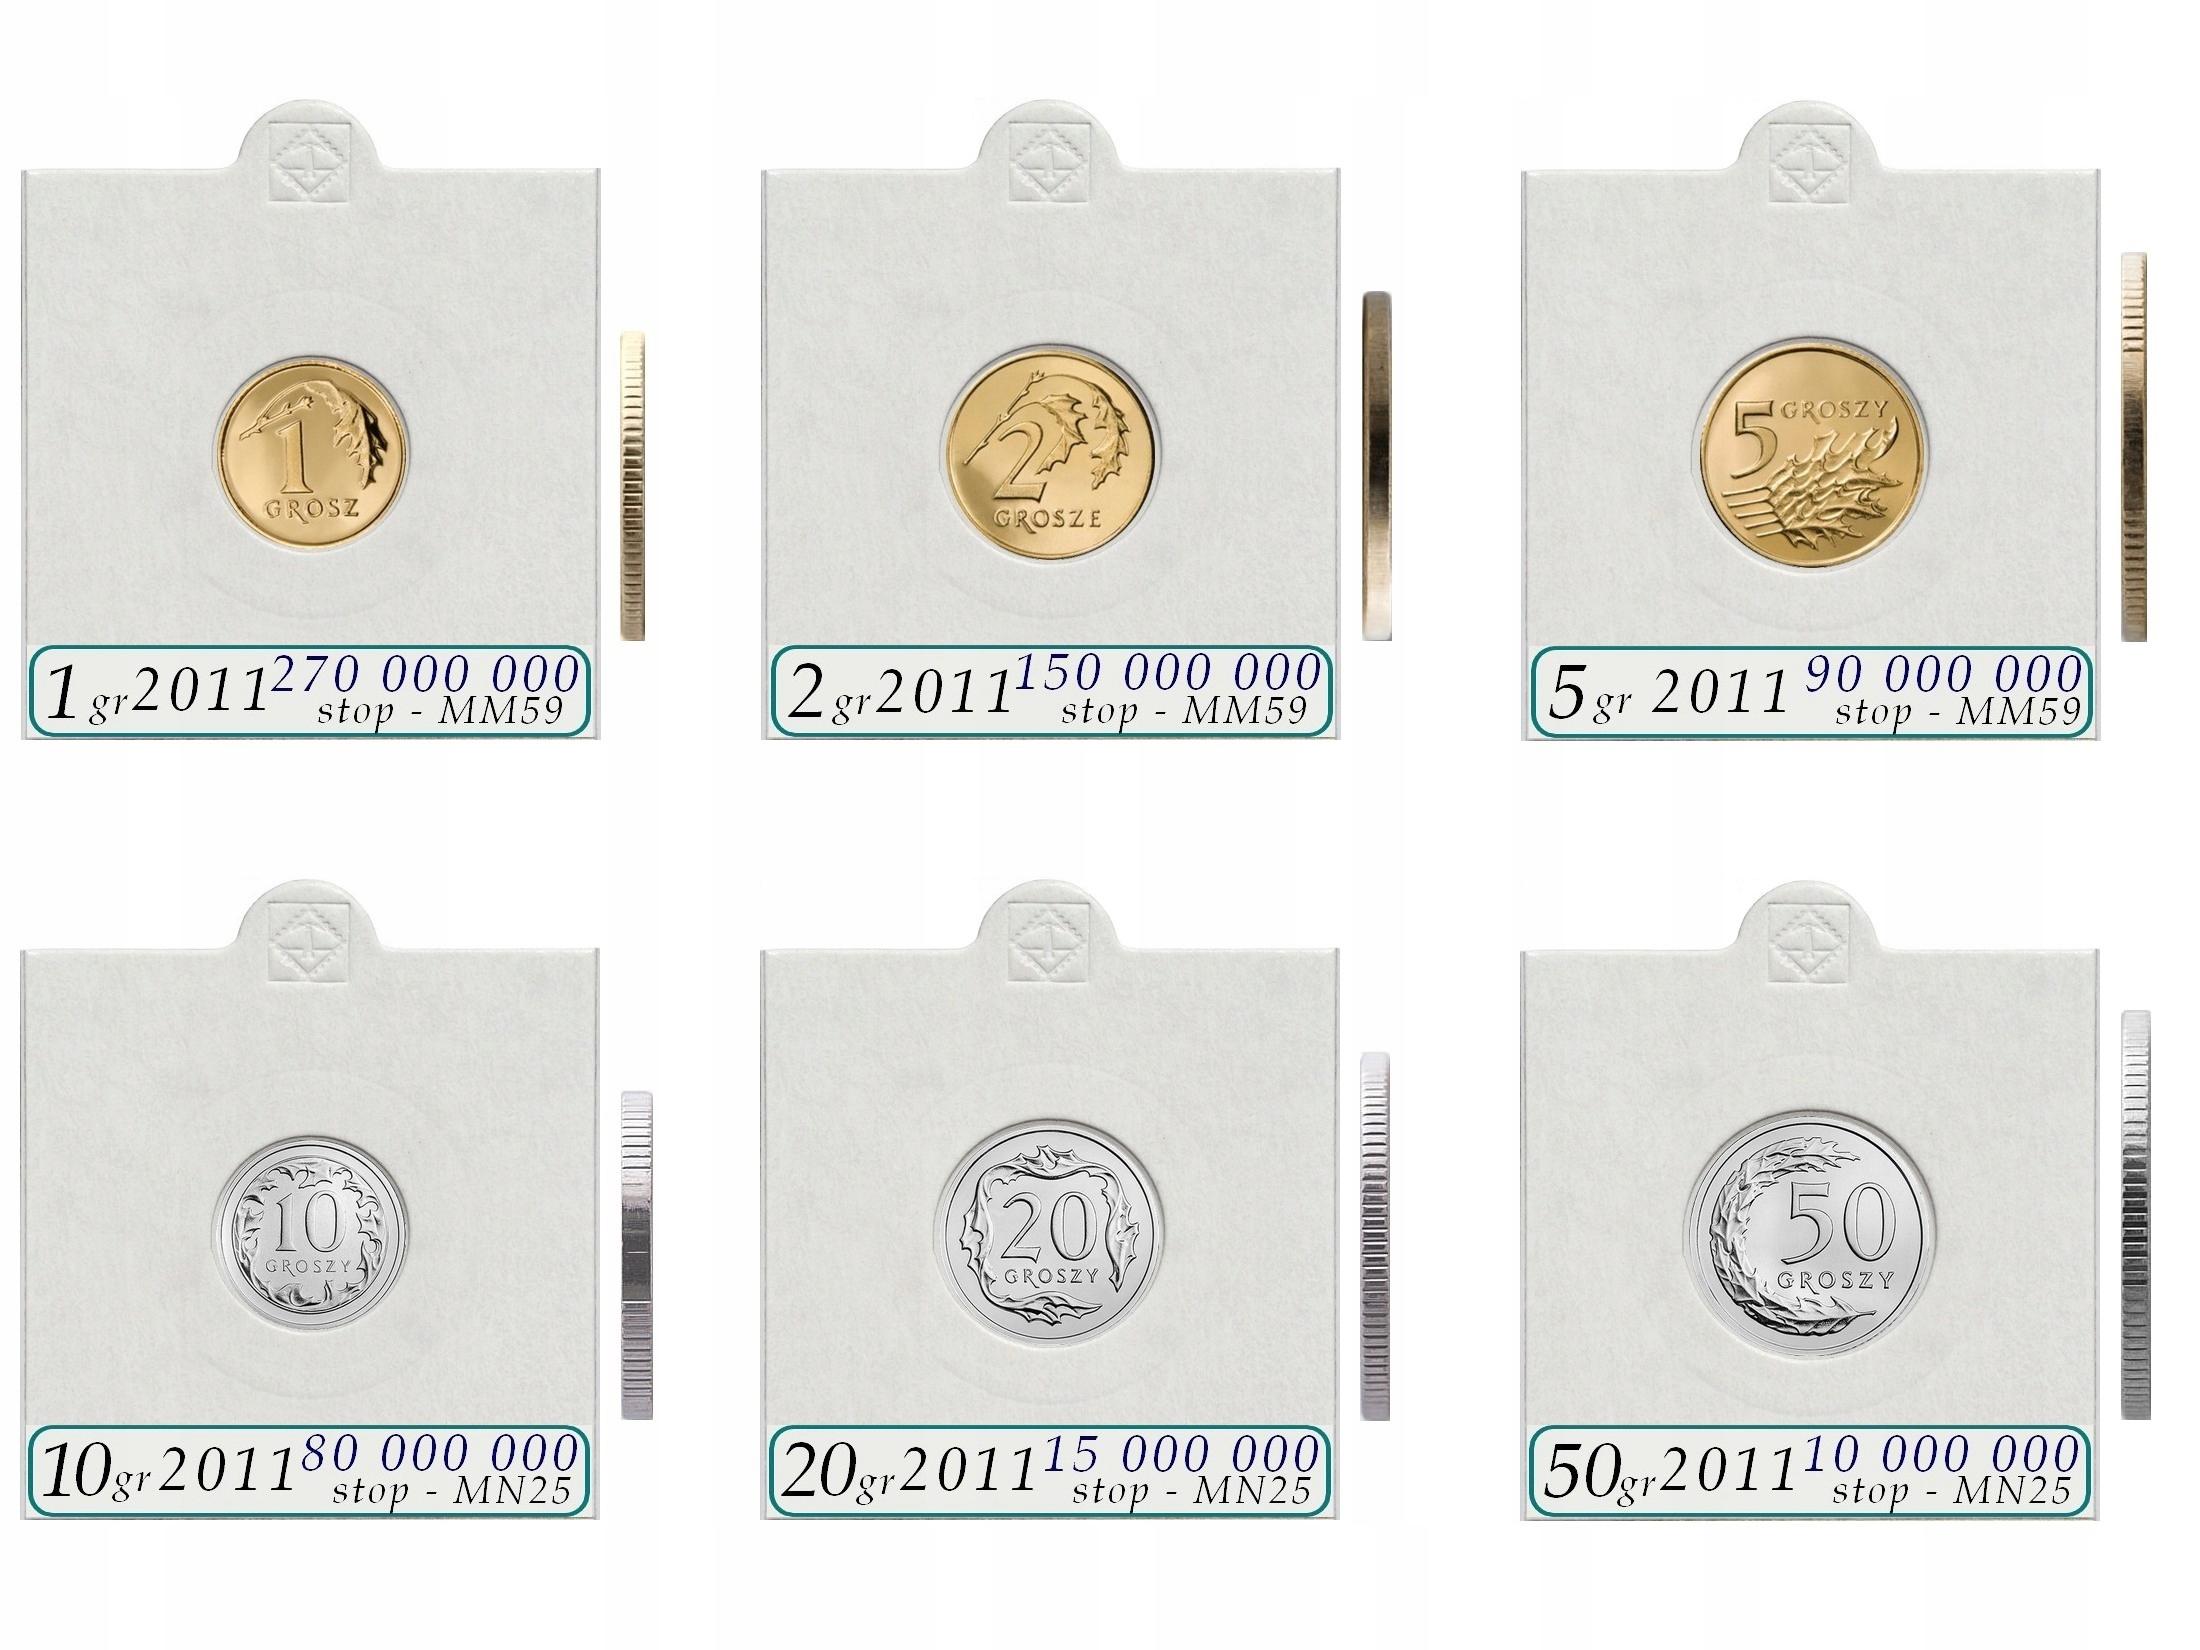 Komplet 6 monet obiegowych 2011 + holdery + opisy